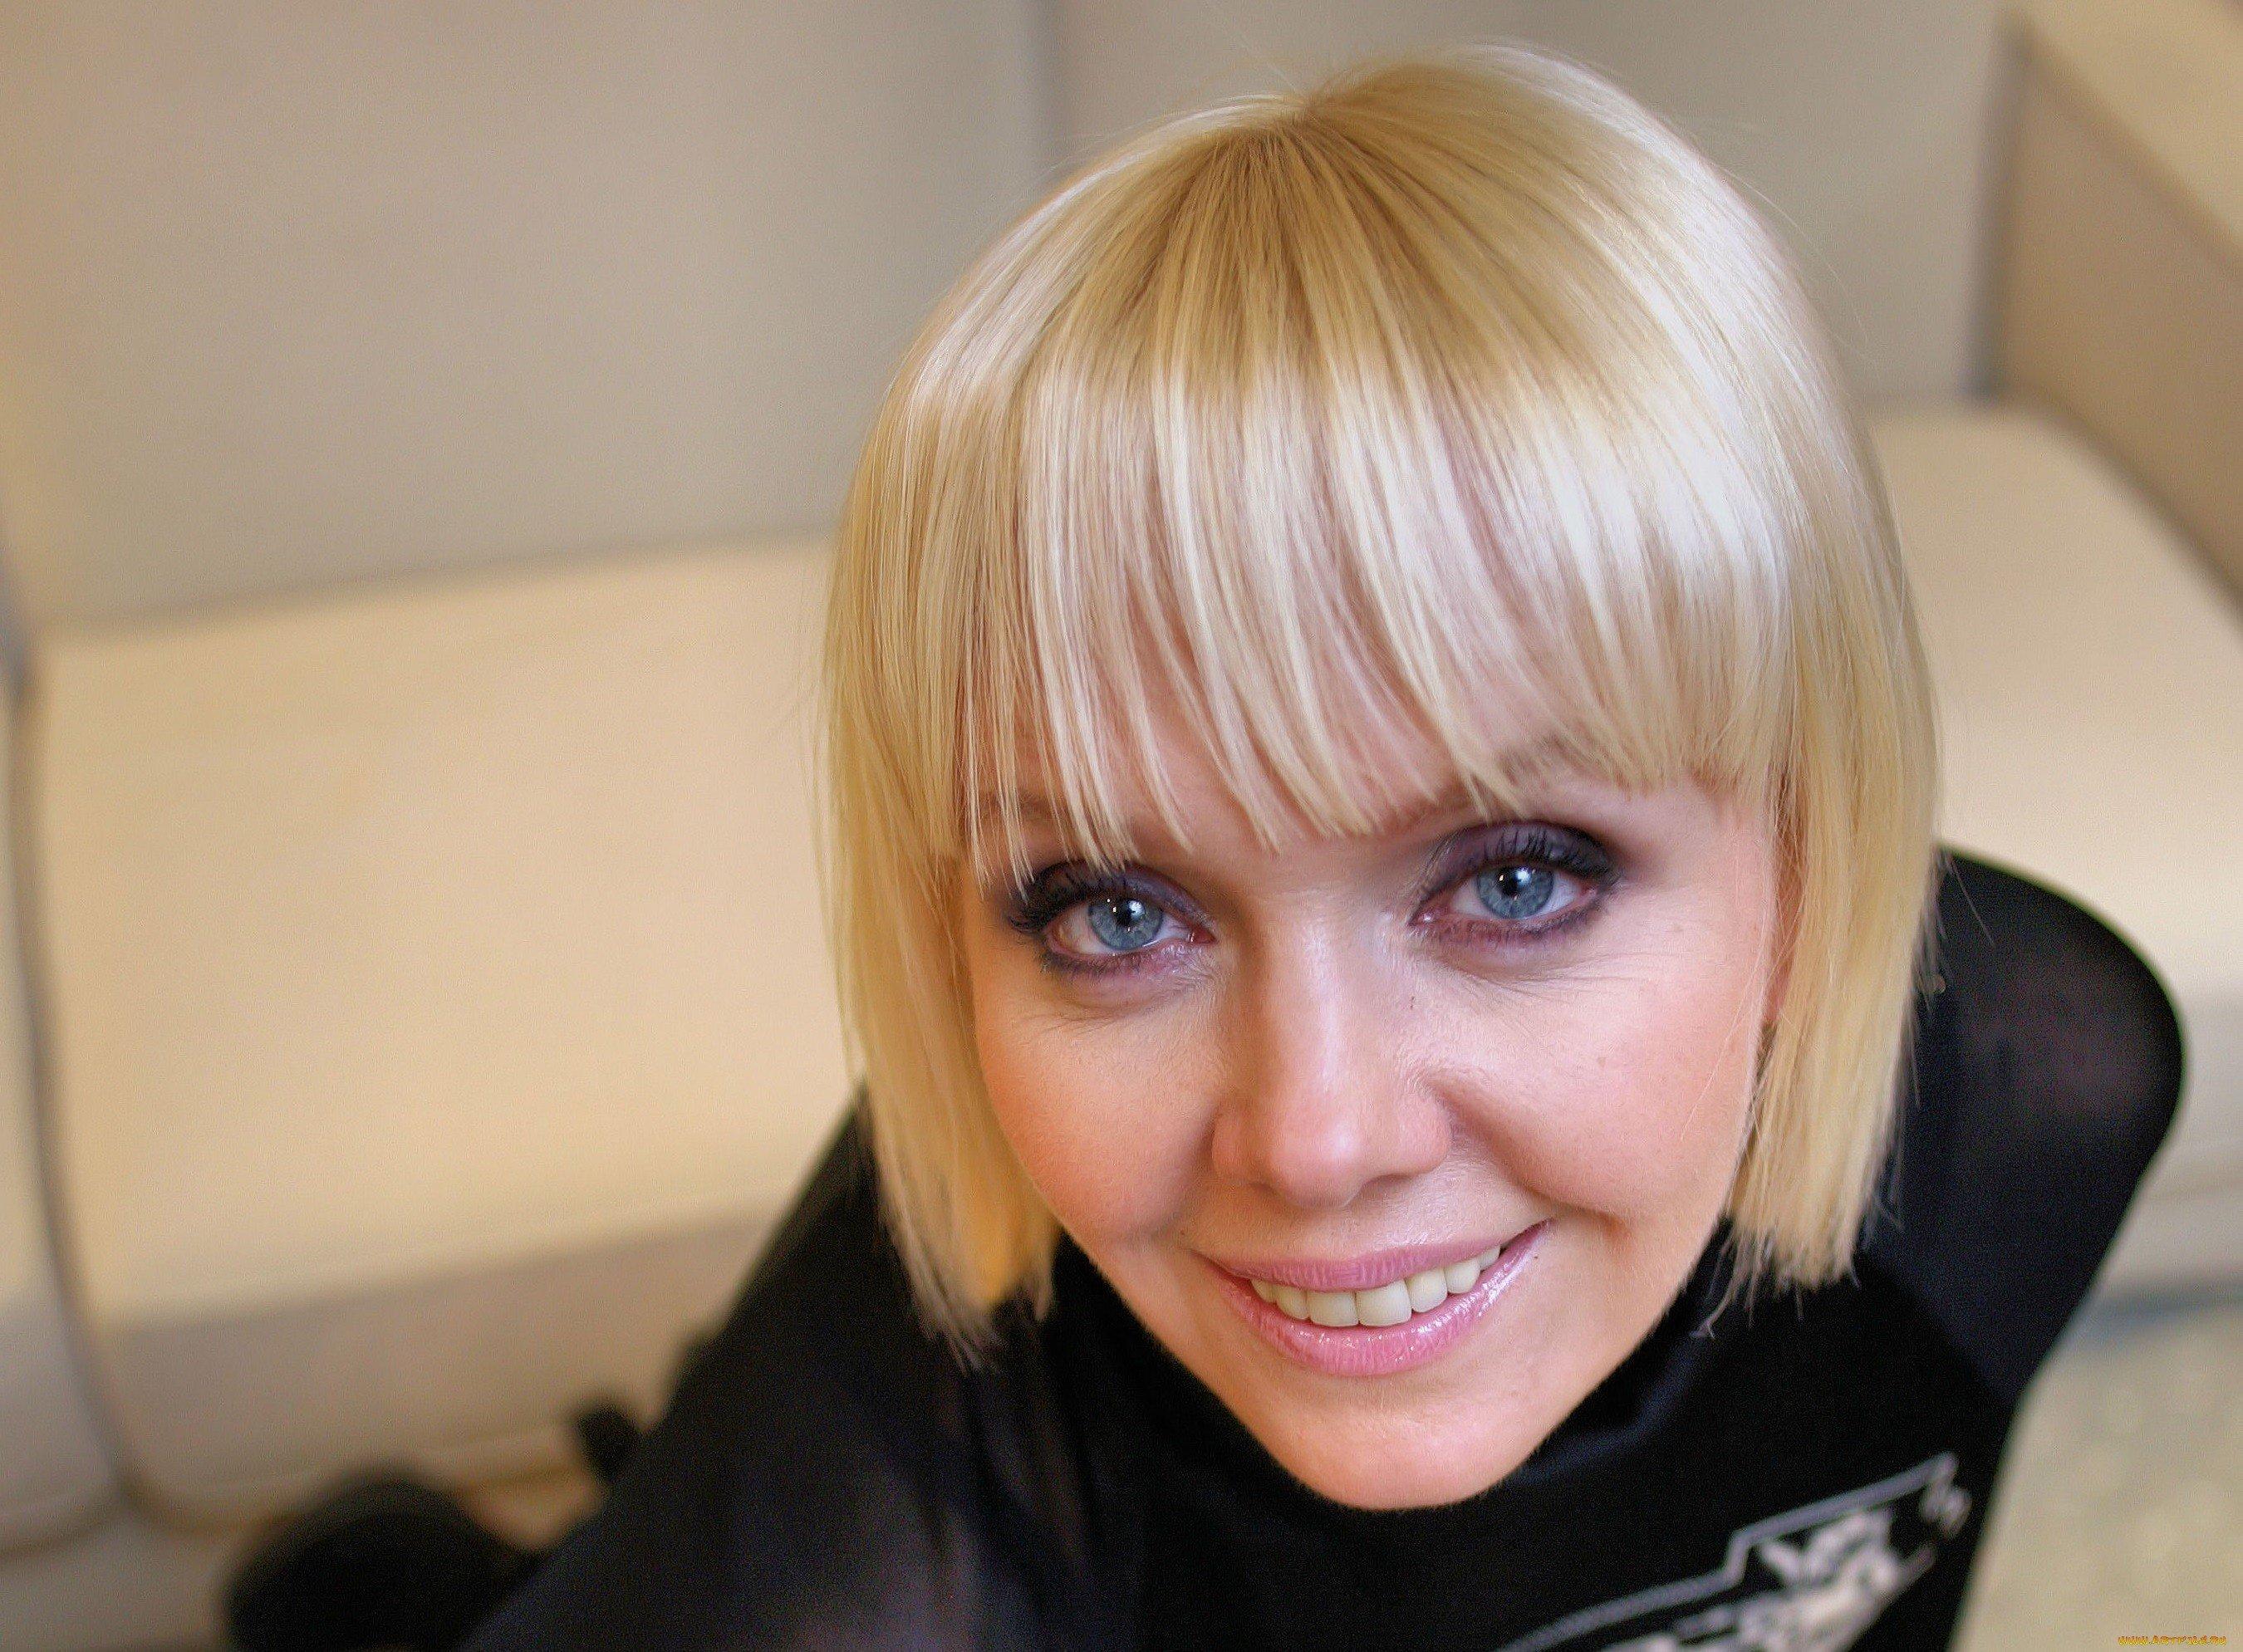 Фото певица валерия без макияжа фото